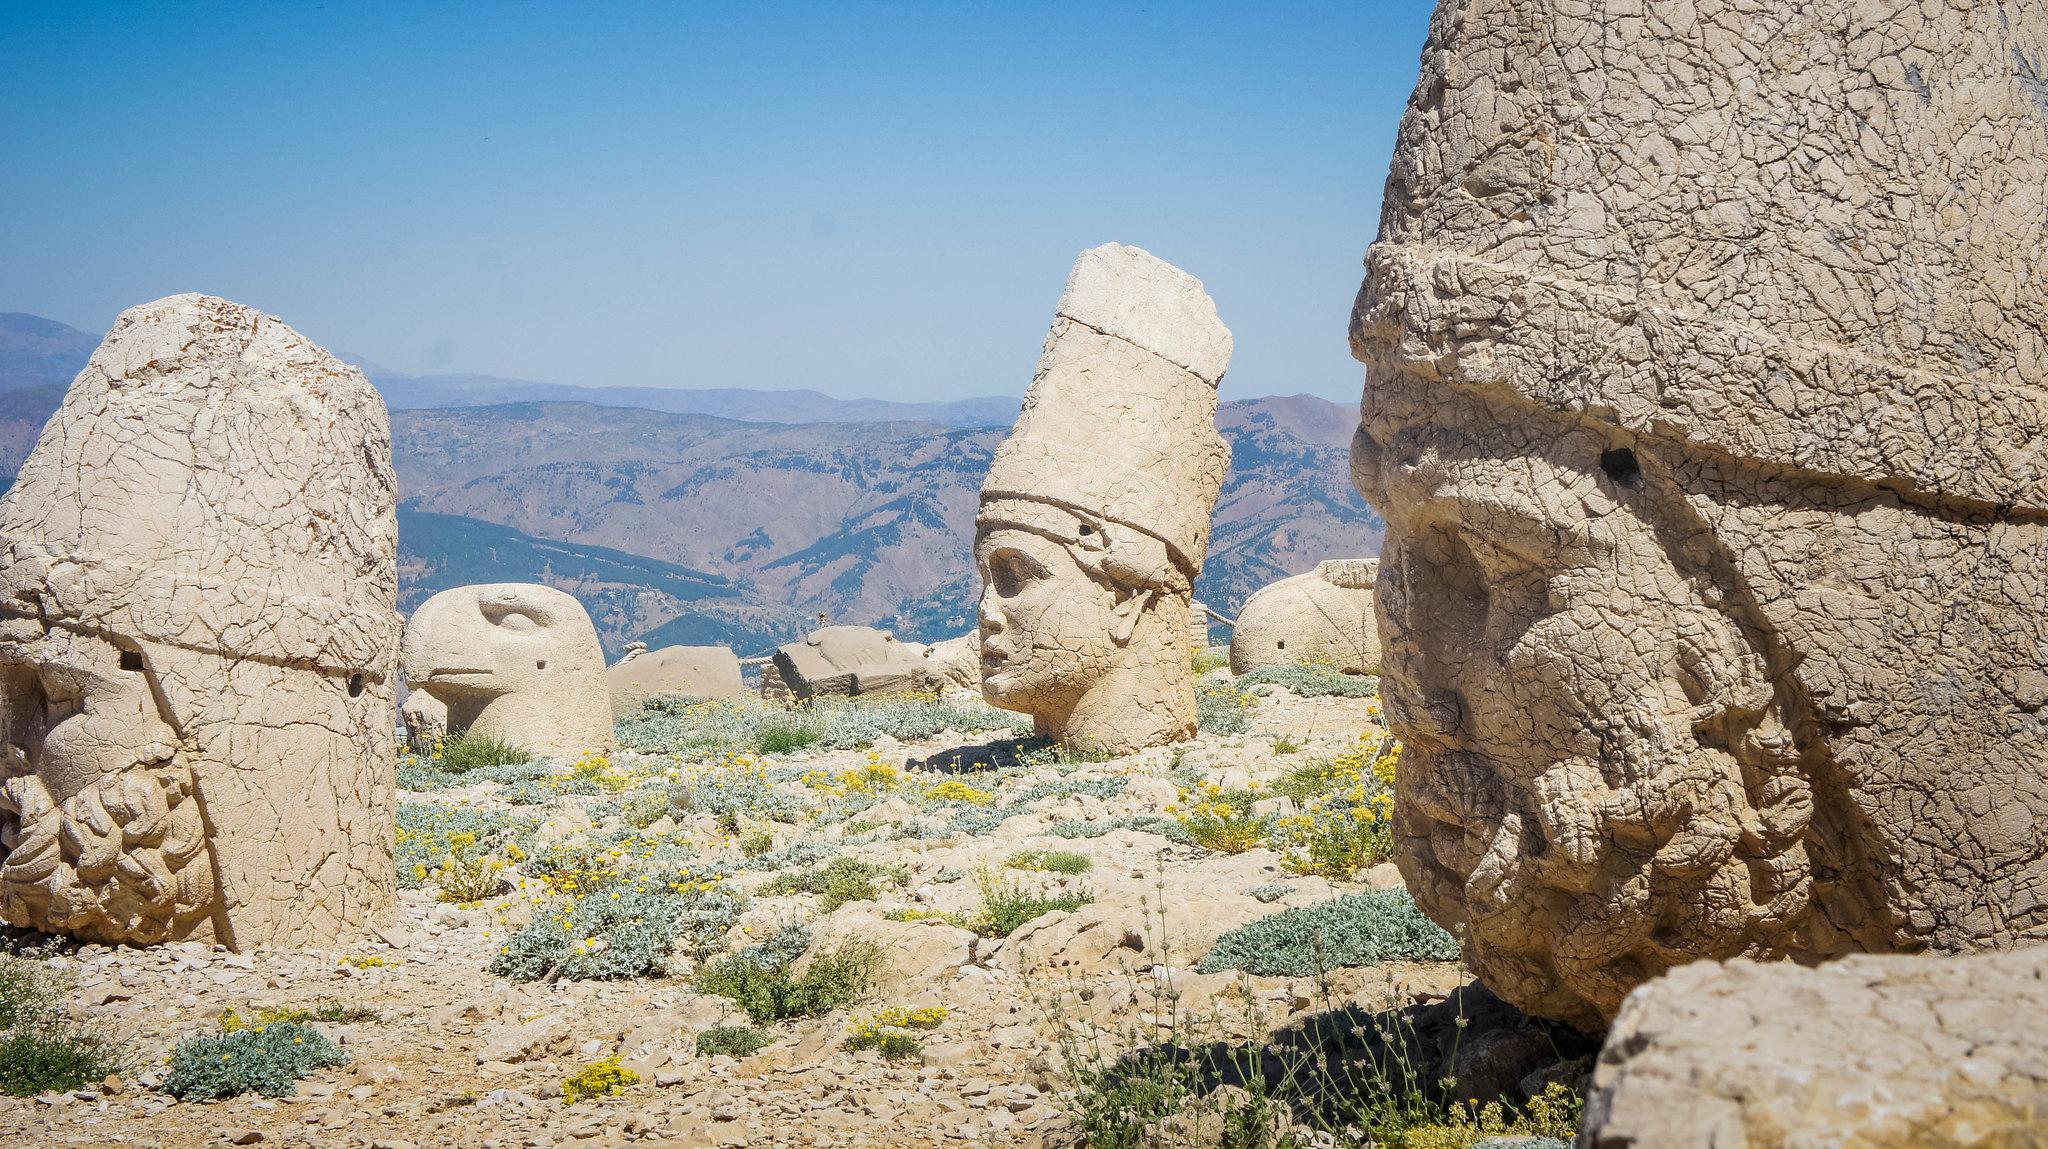 Scattered heads at Nemrut Dağ